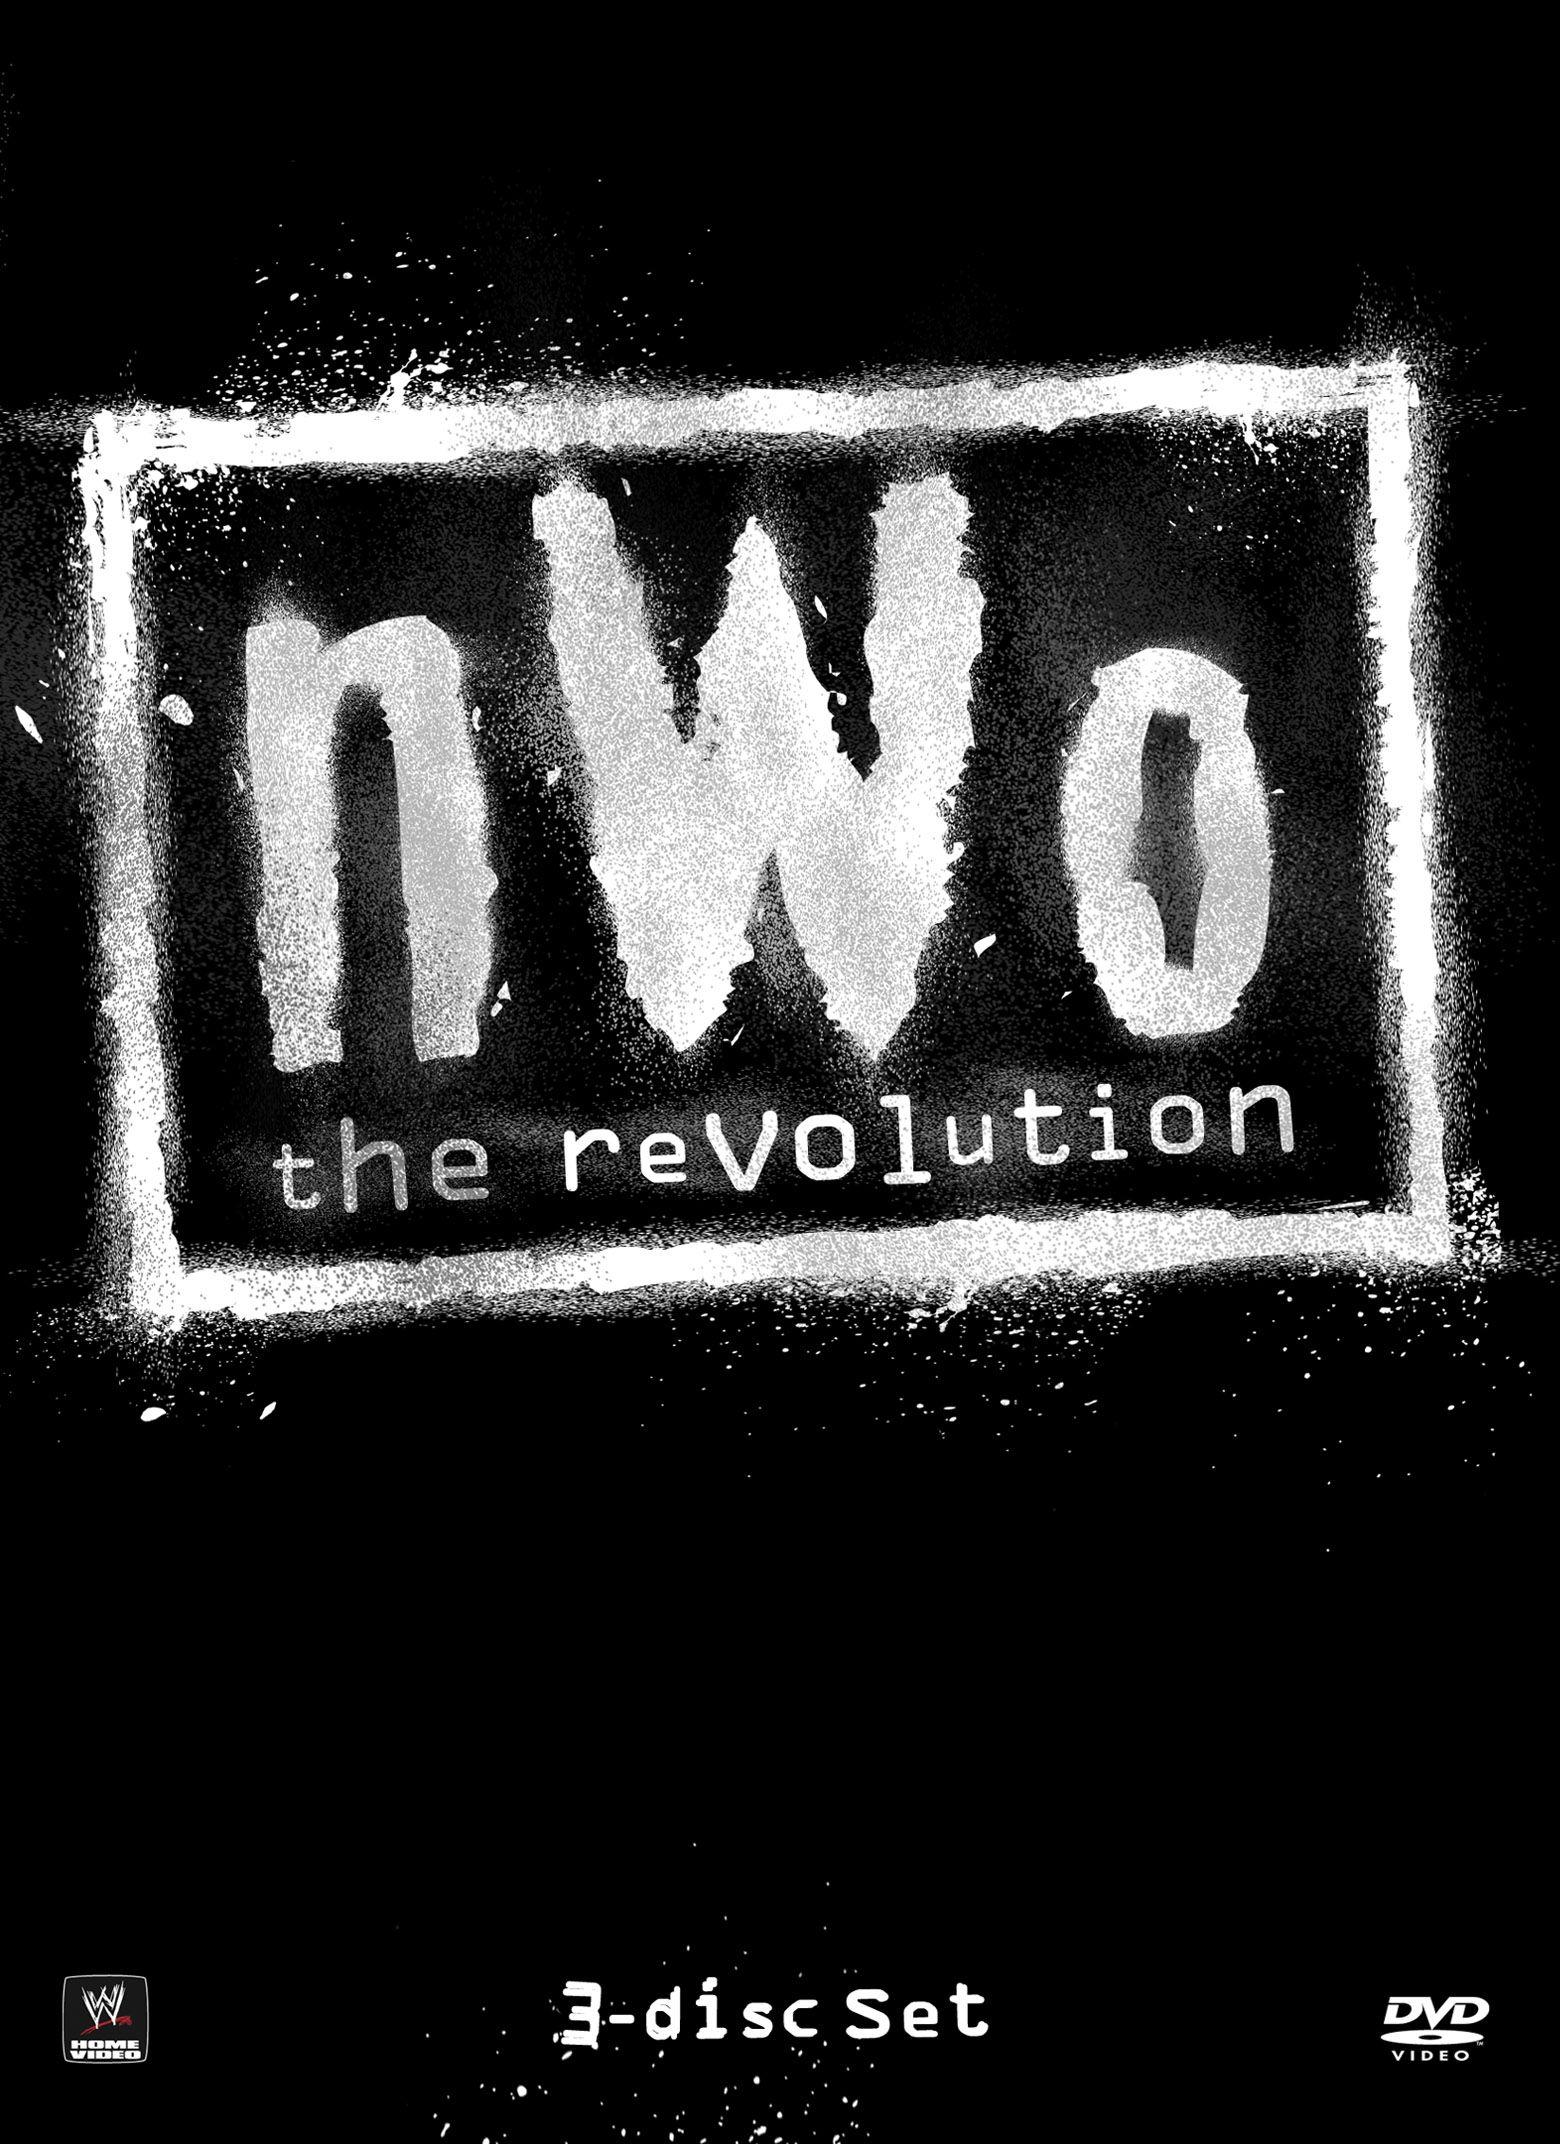 WWE: nWo - The Revolution